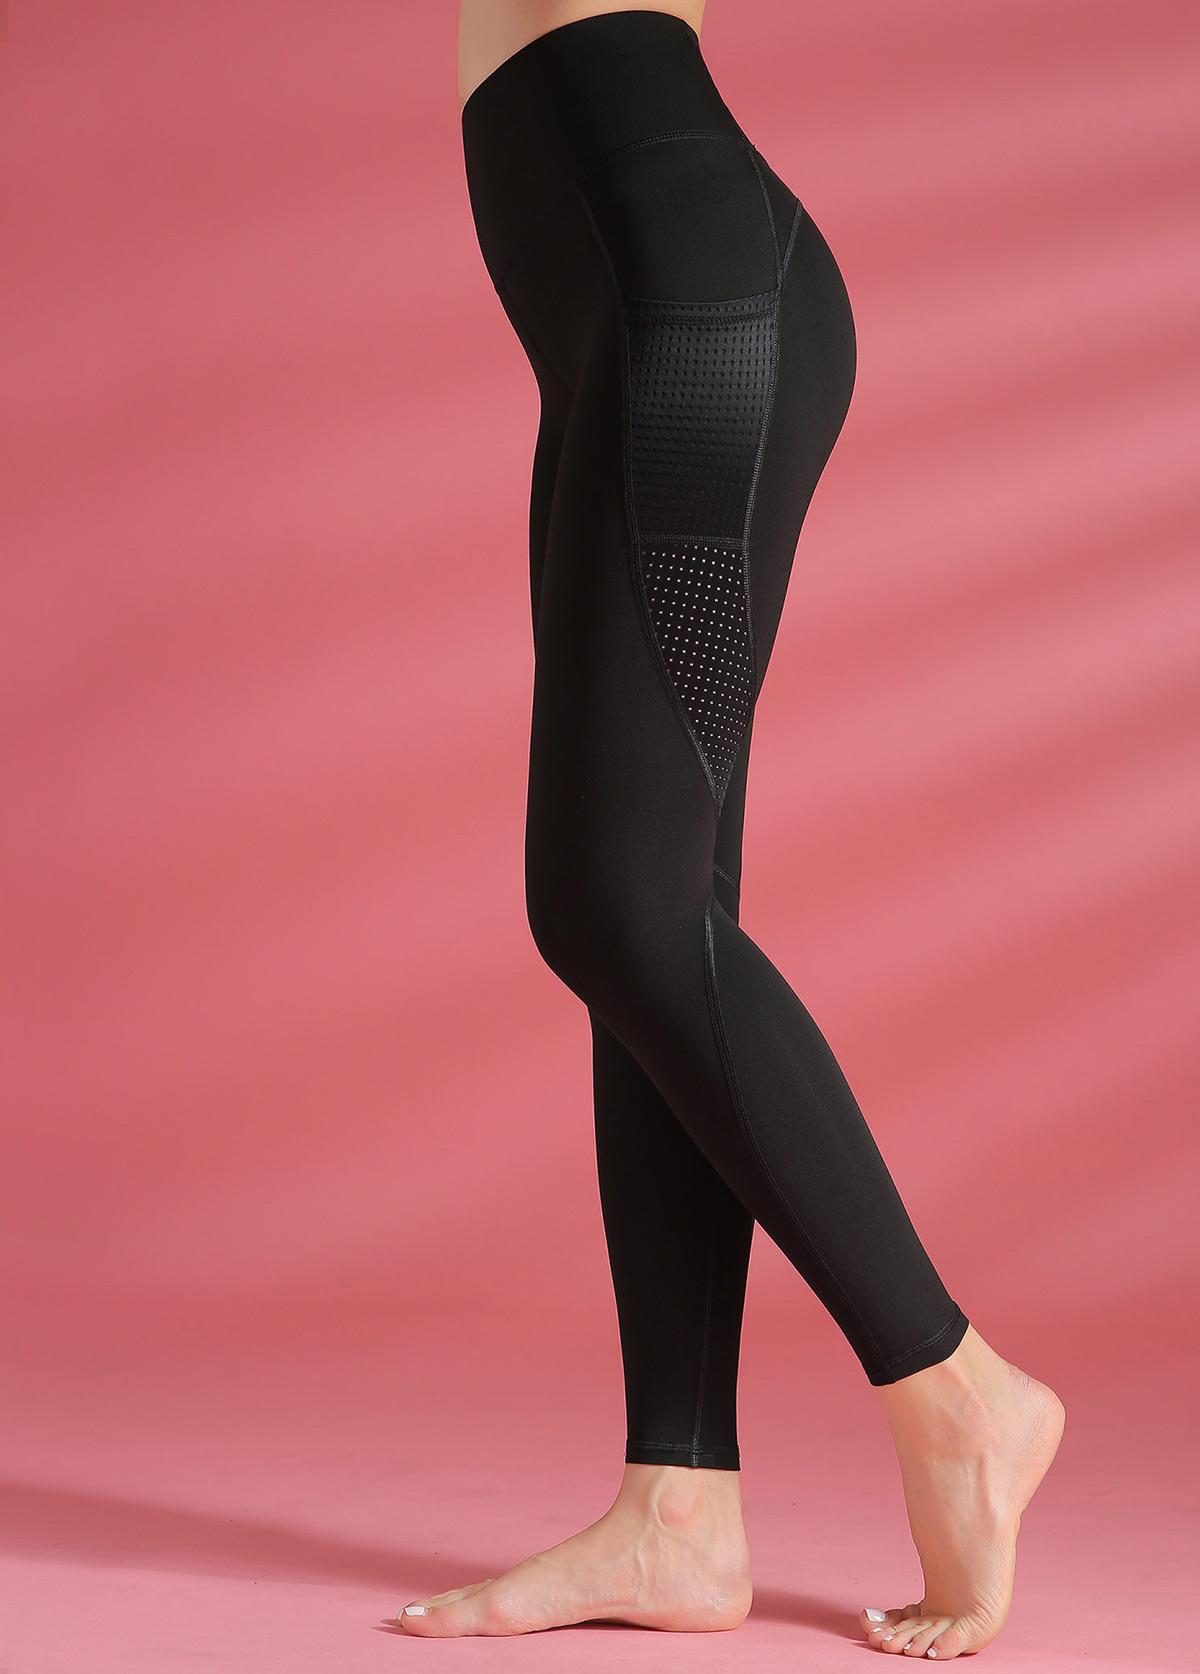 High Waist Black Yoga Leggings